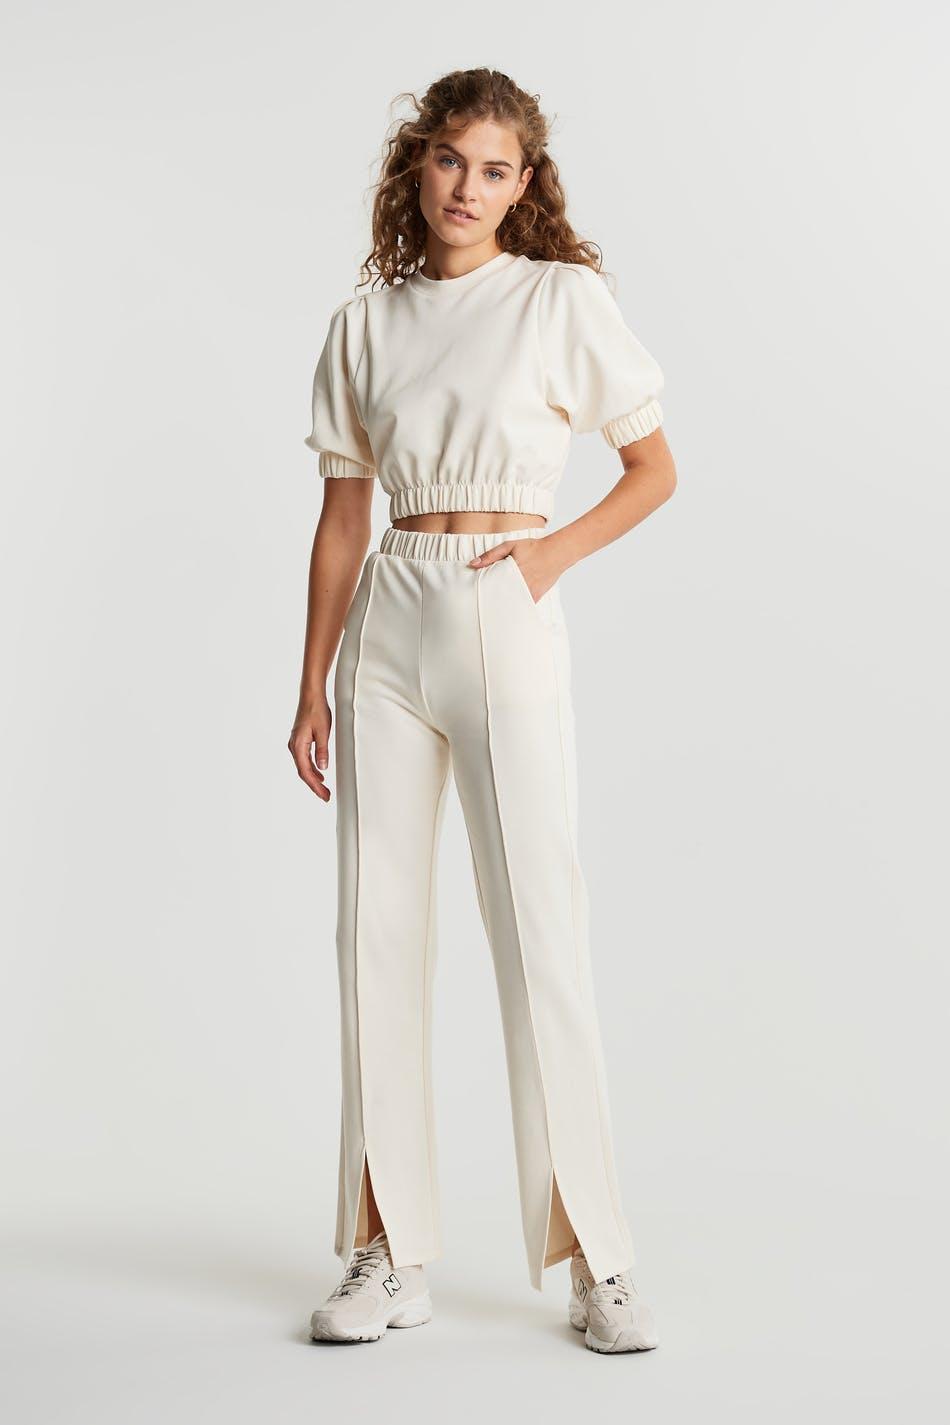 Klara trousers